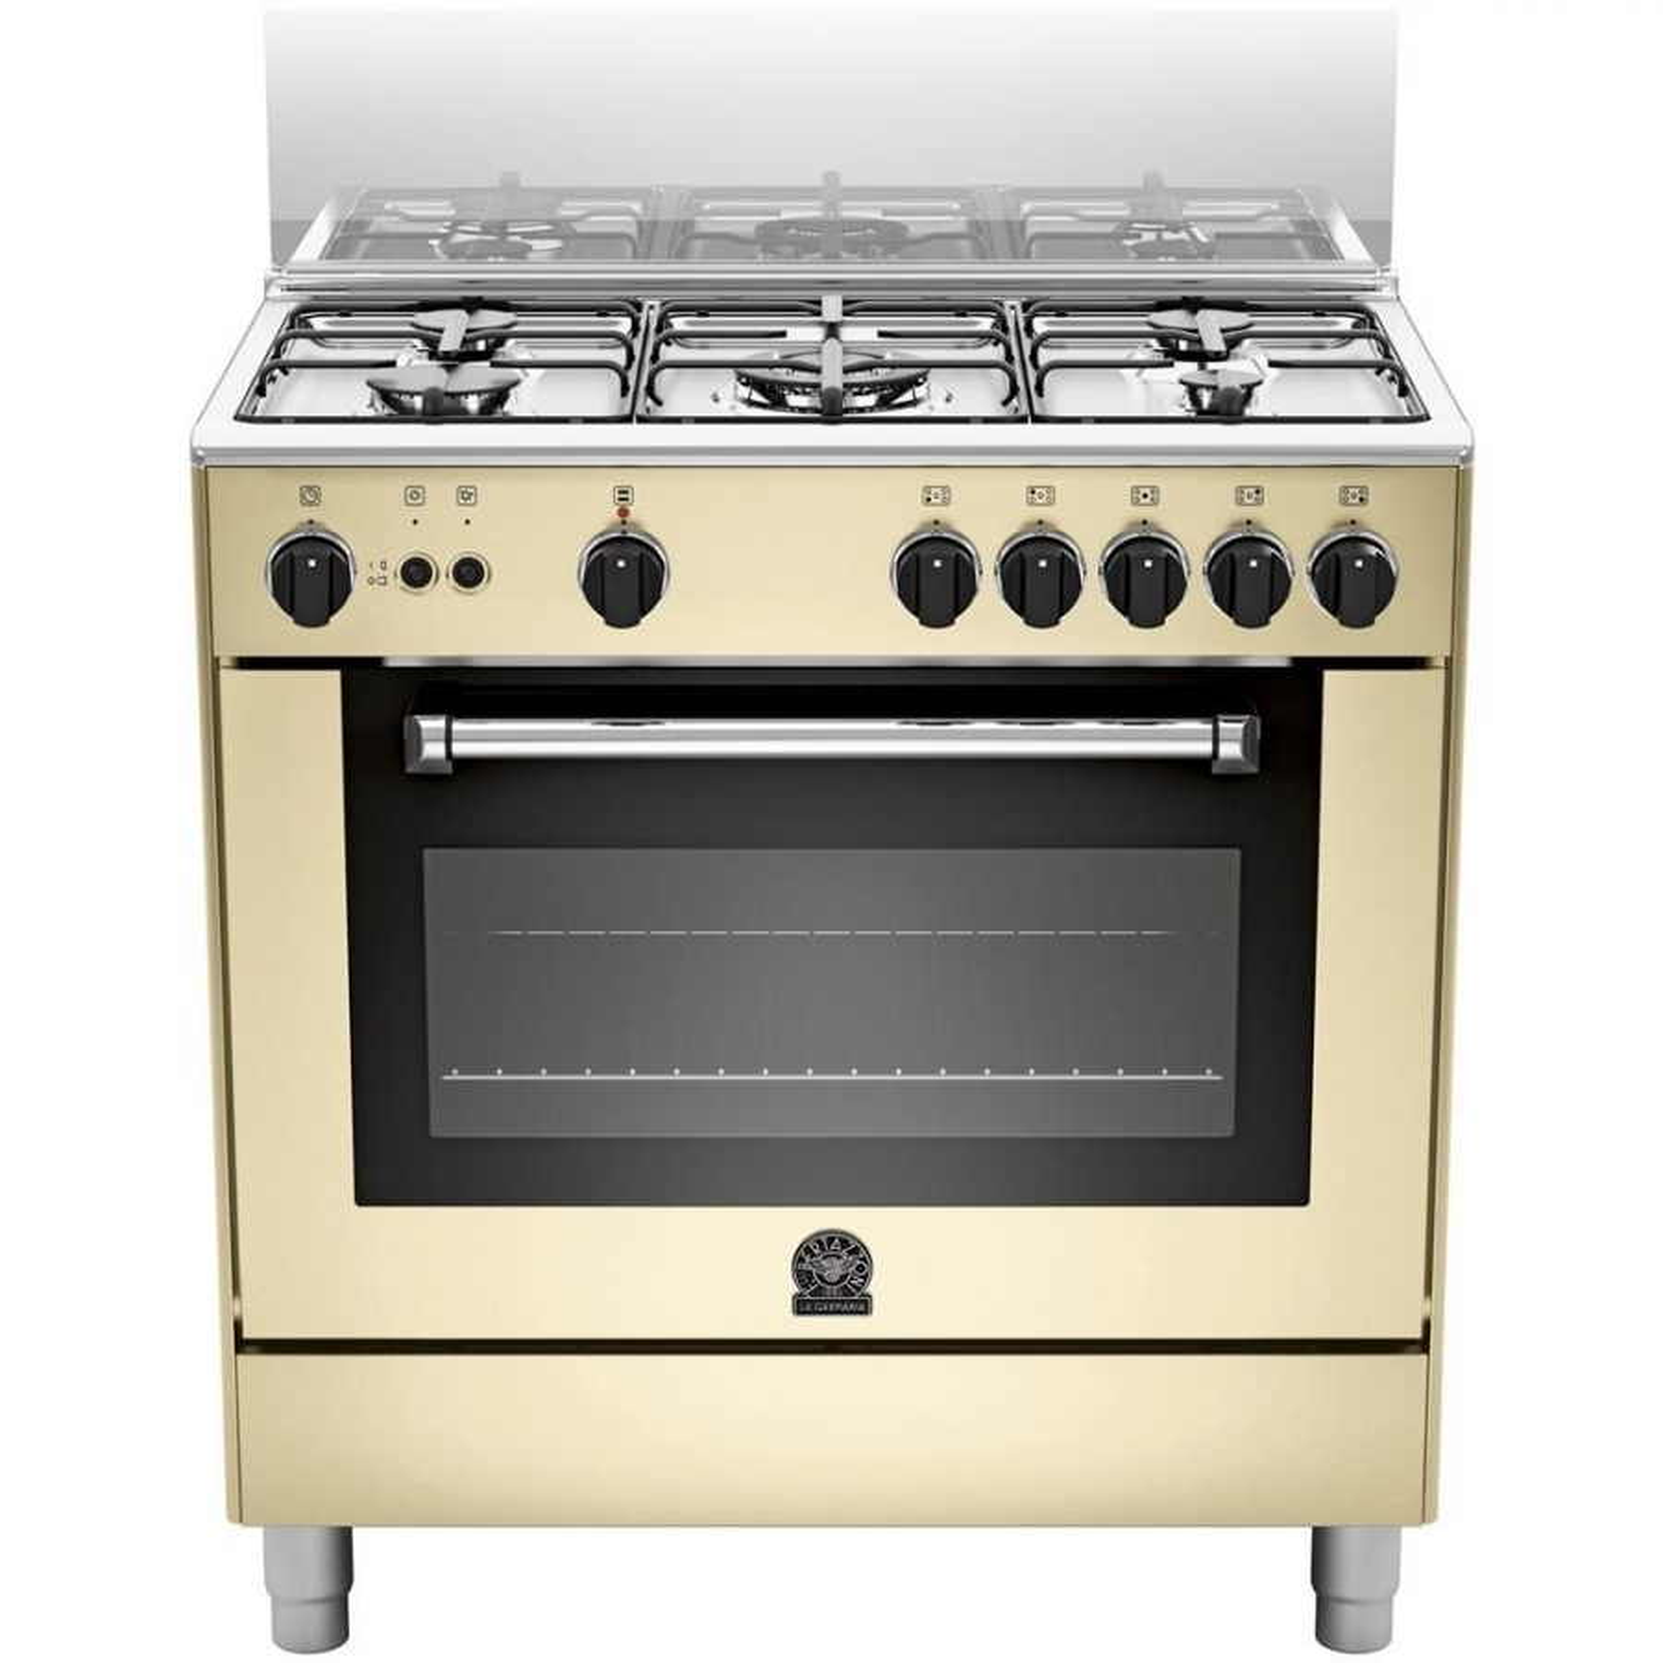 Cucina la germania am85c61ccrt 5 fuochi a gas forno for Cucina 5 fuochi 70x60